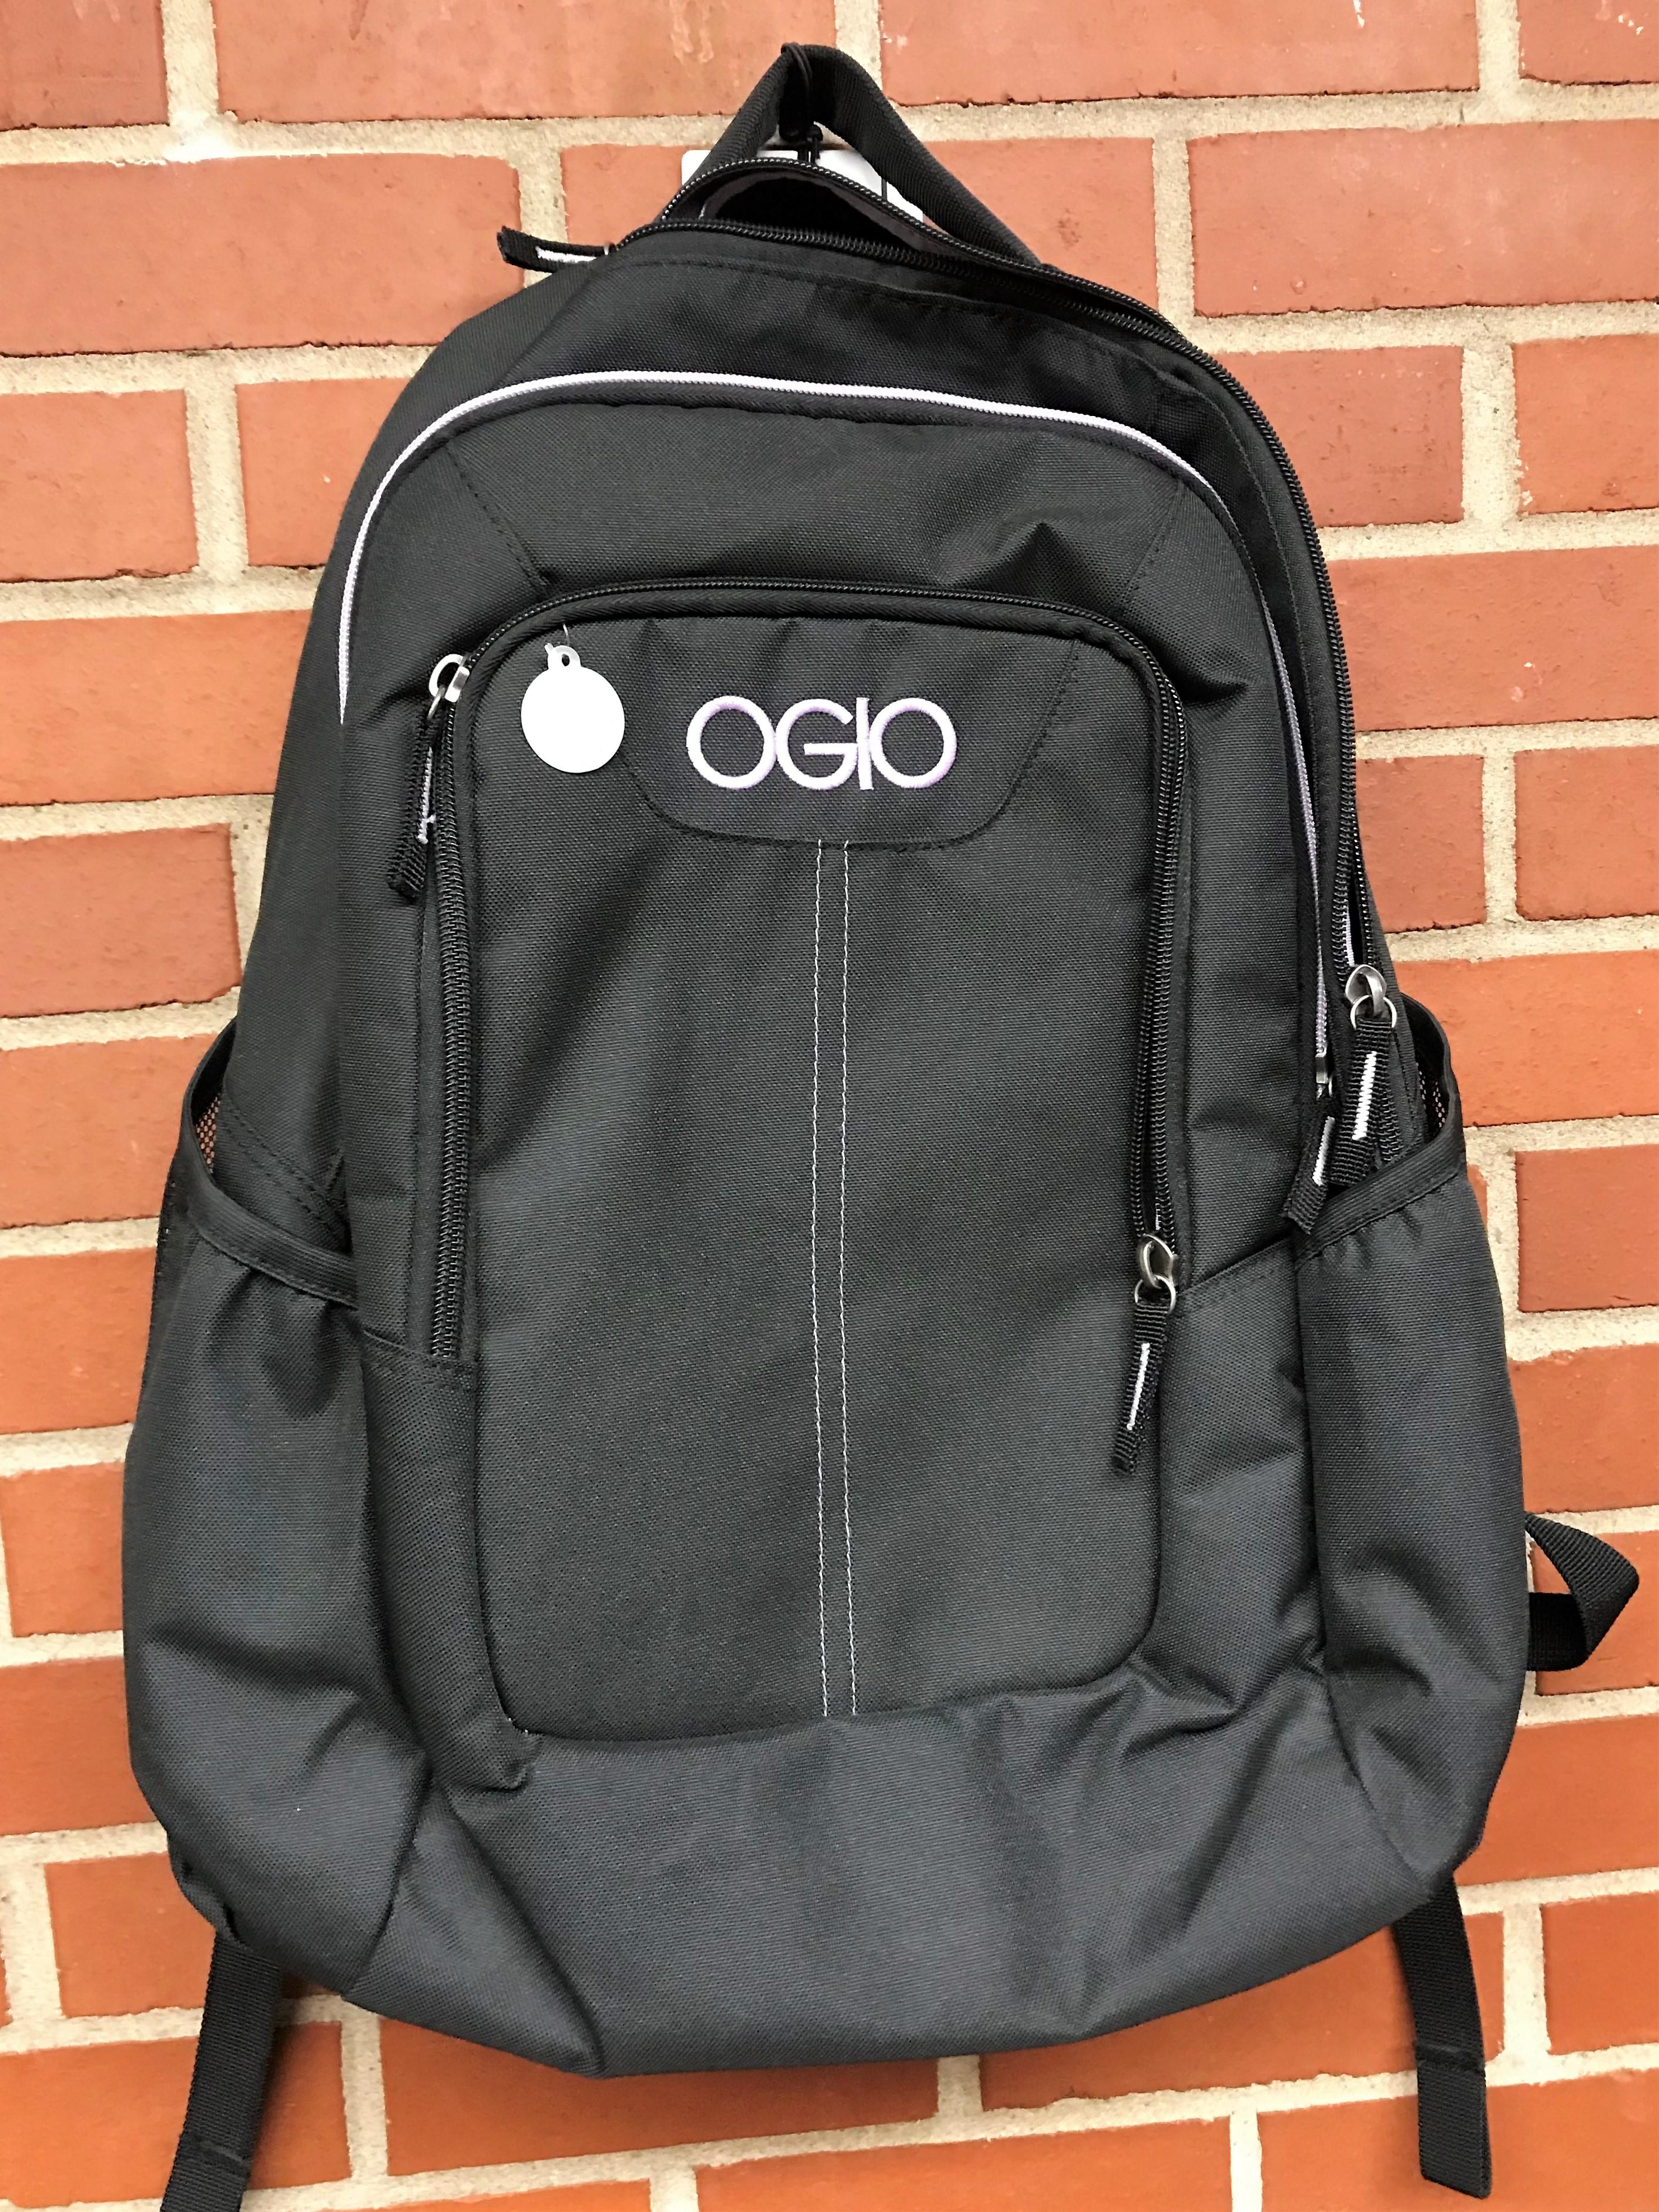 OGIO OPERATRIX BACKPACK